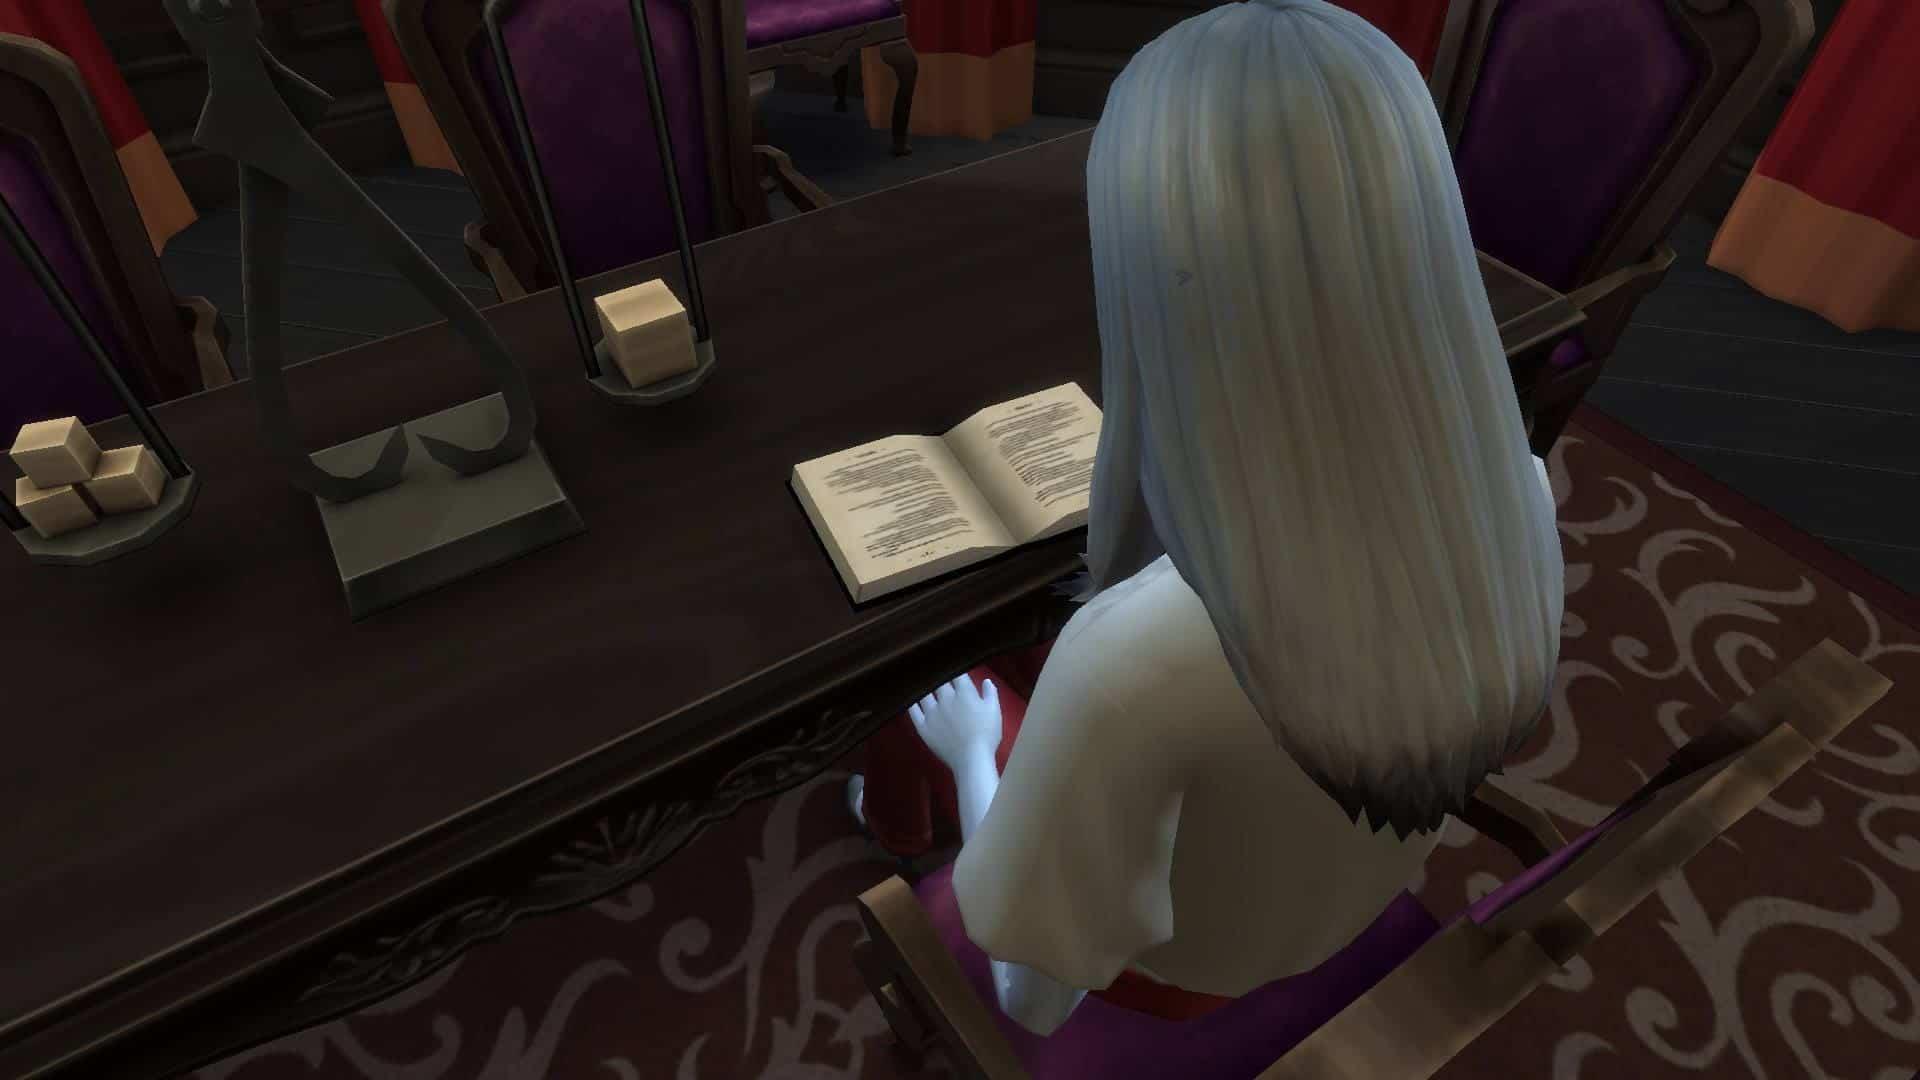 Les histoires de Mylavia Vopira  3